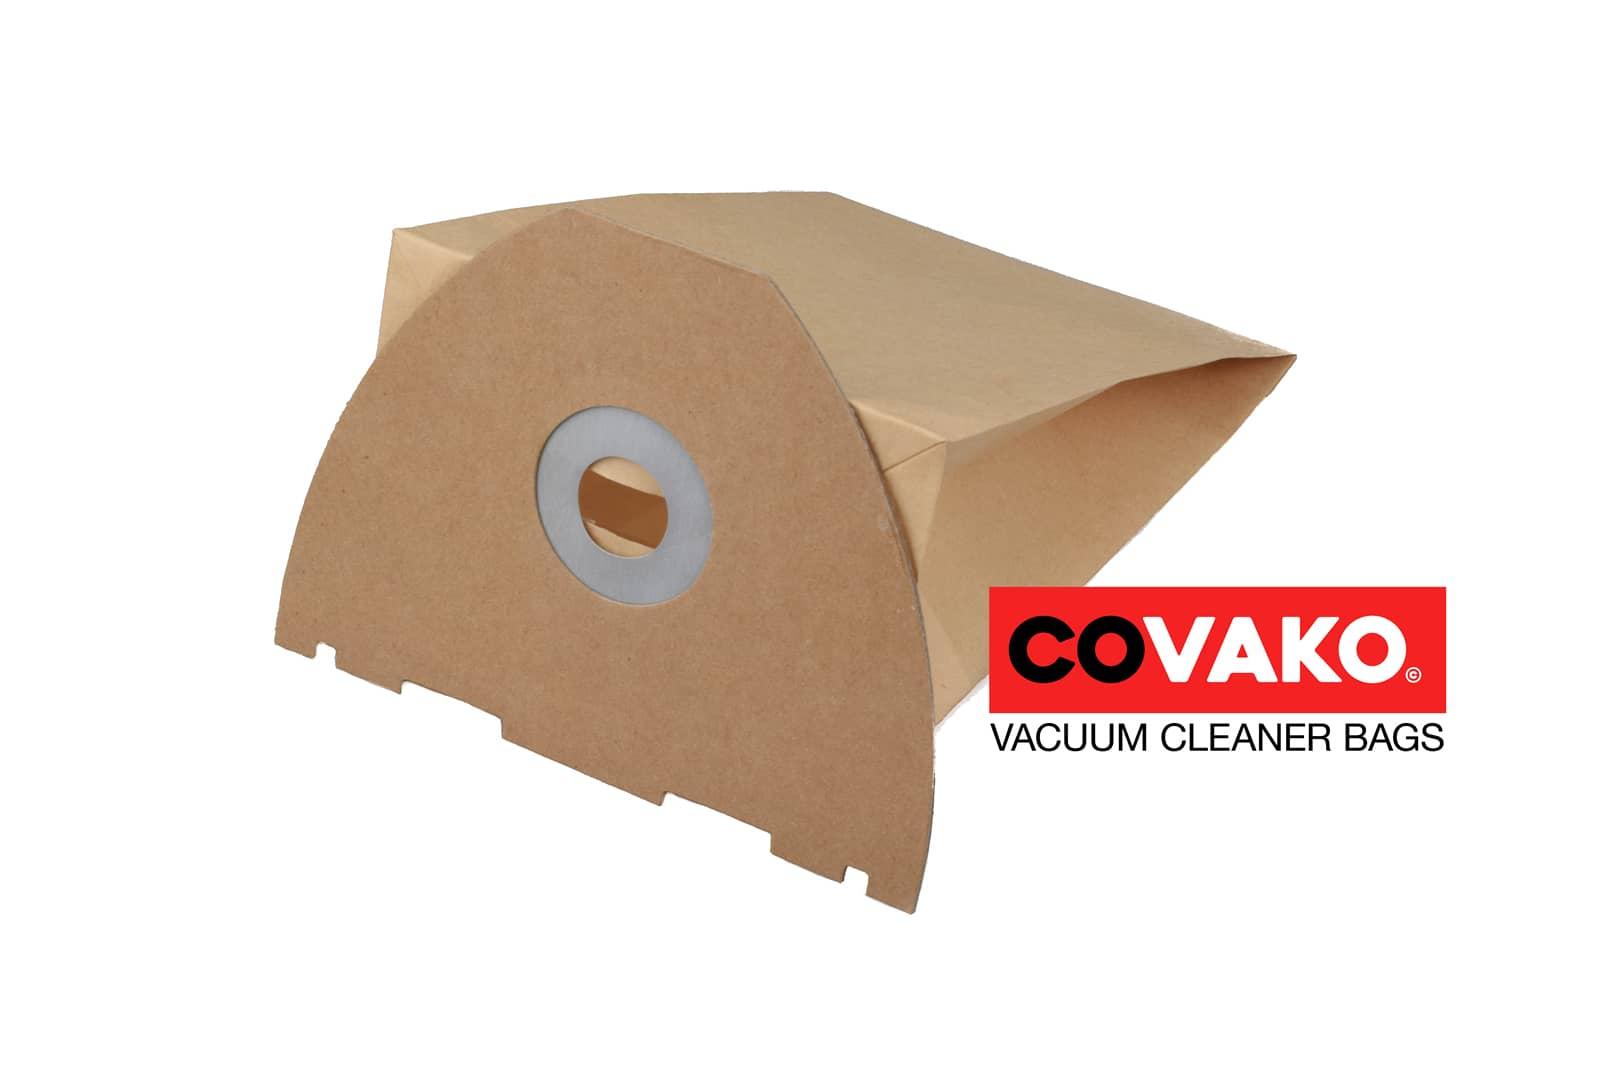 Wap UZ 964 / Papier - Wap sacs d'aspirateur